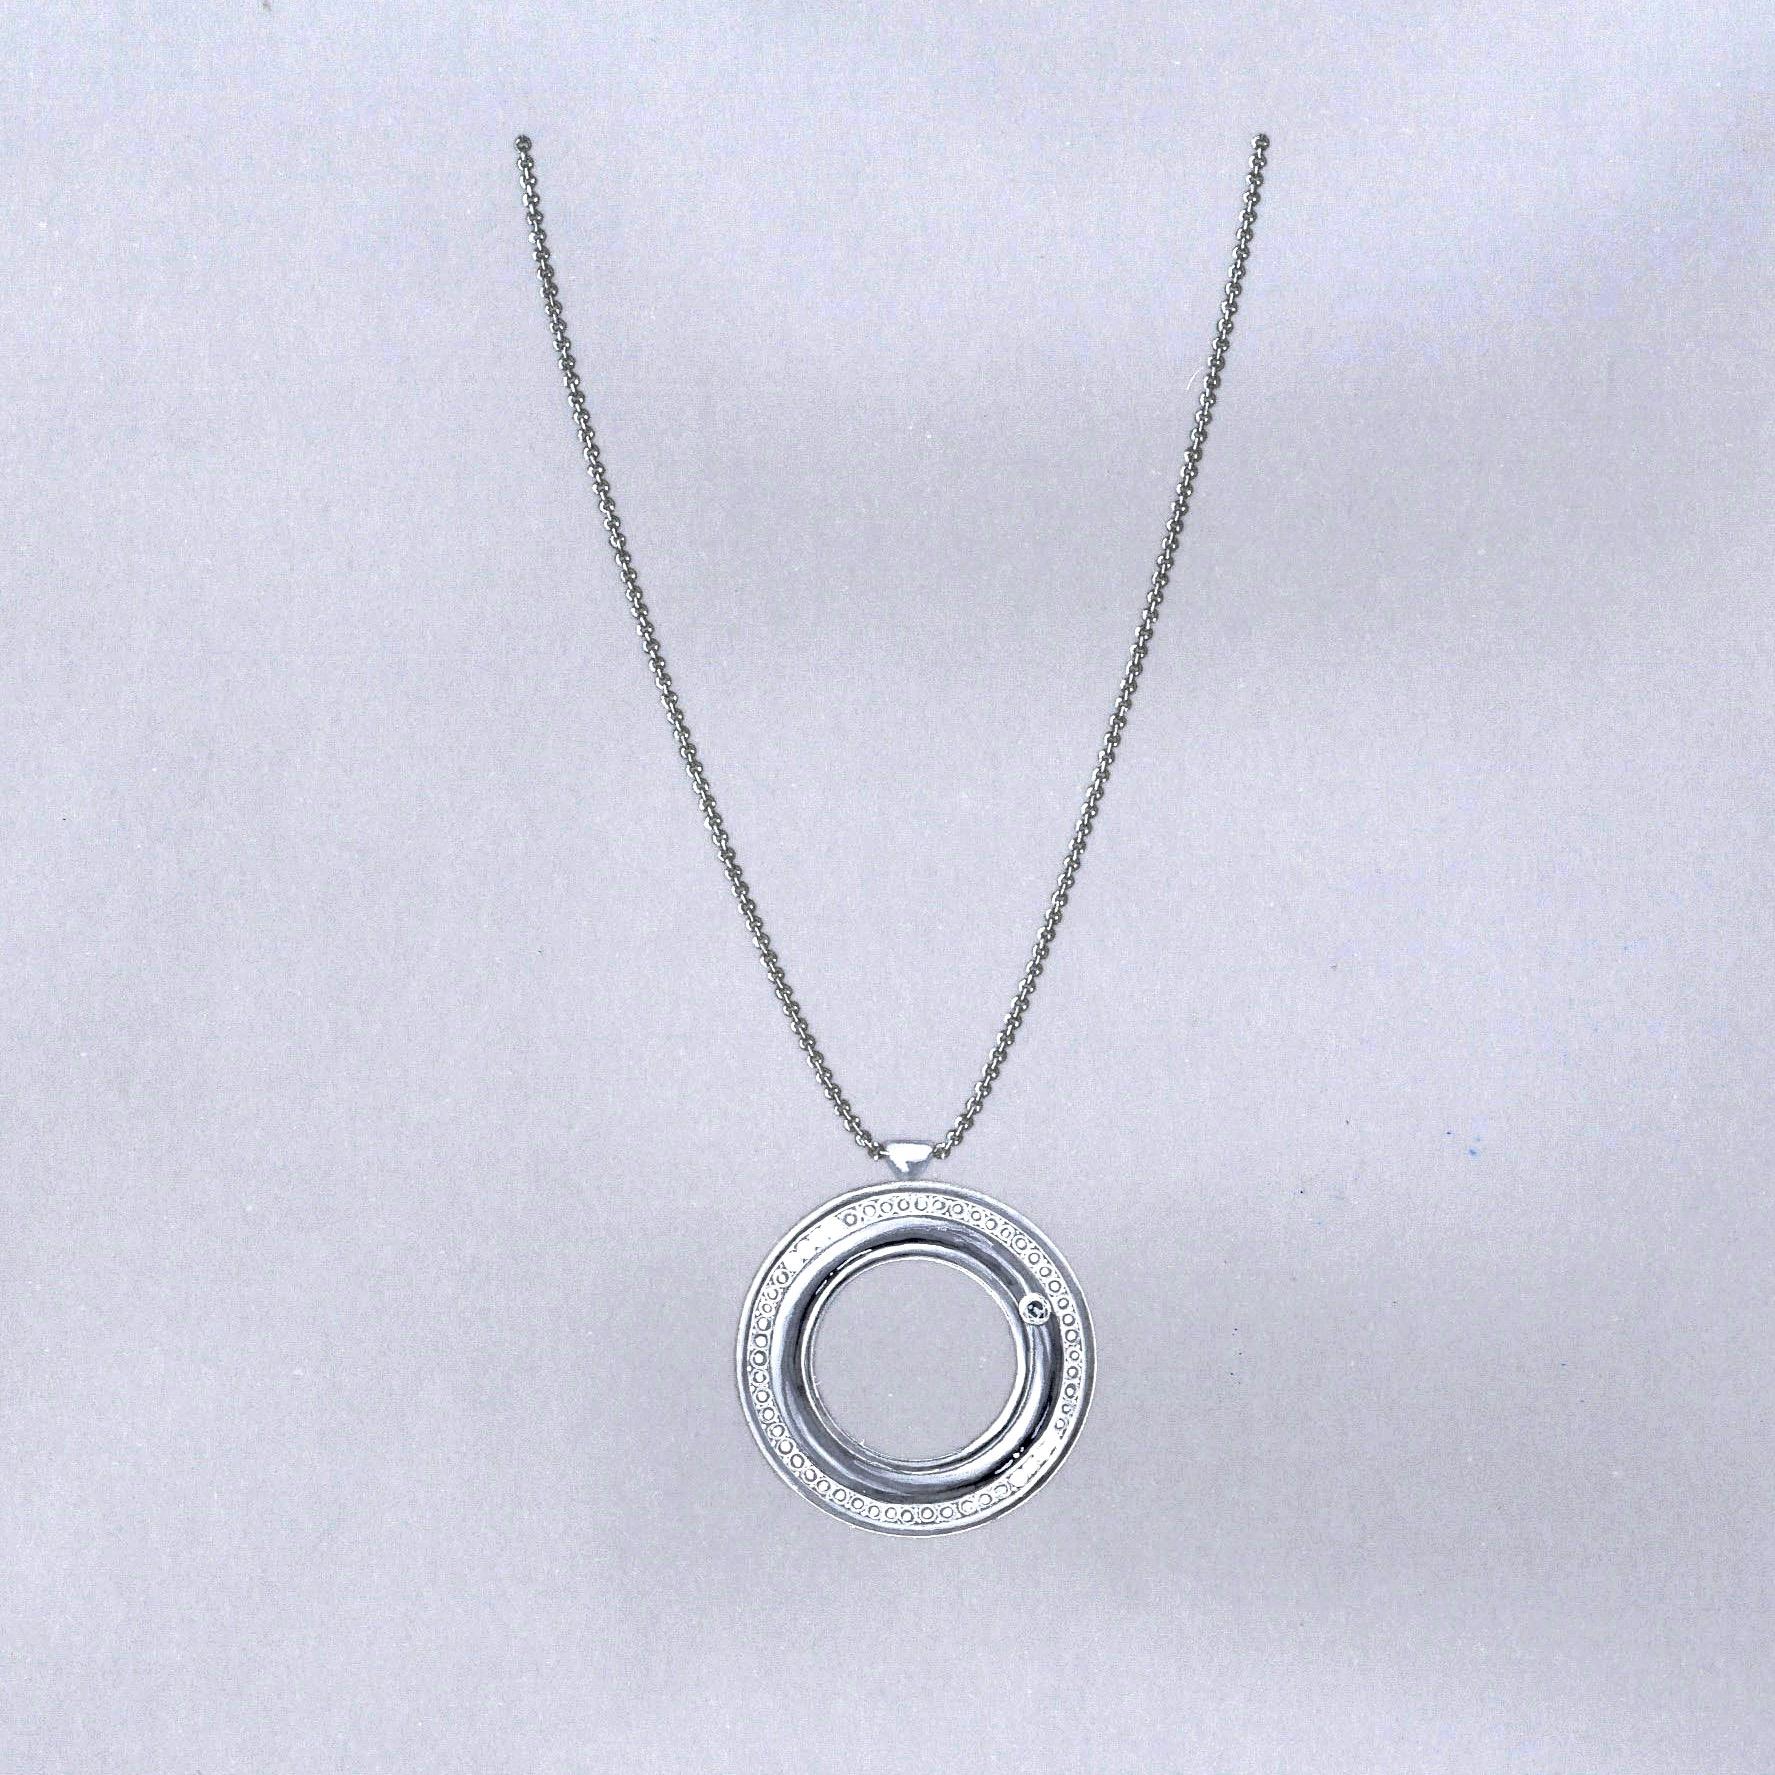 Gouache pendentif Piaget diamants